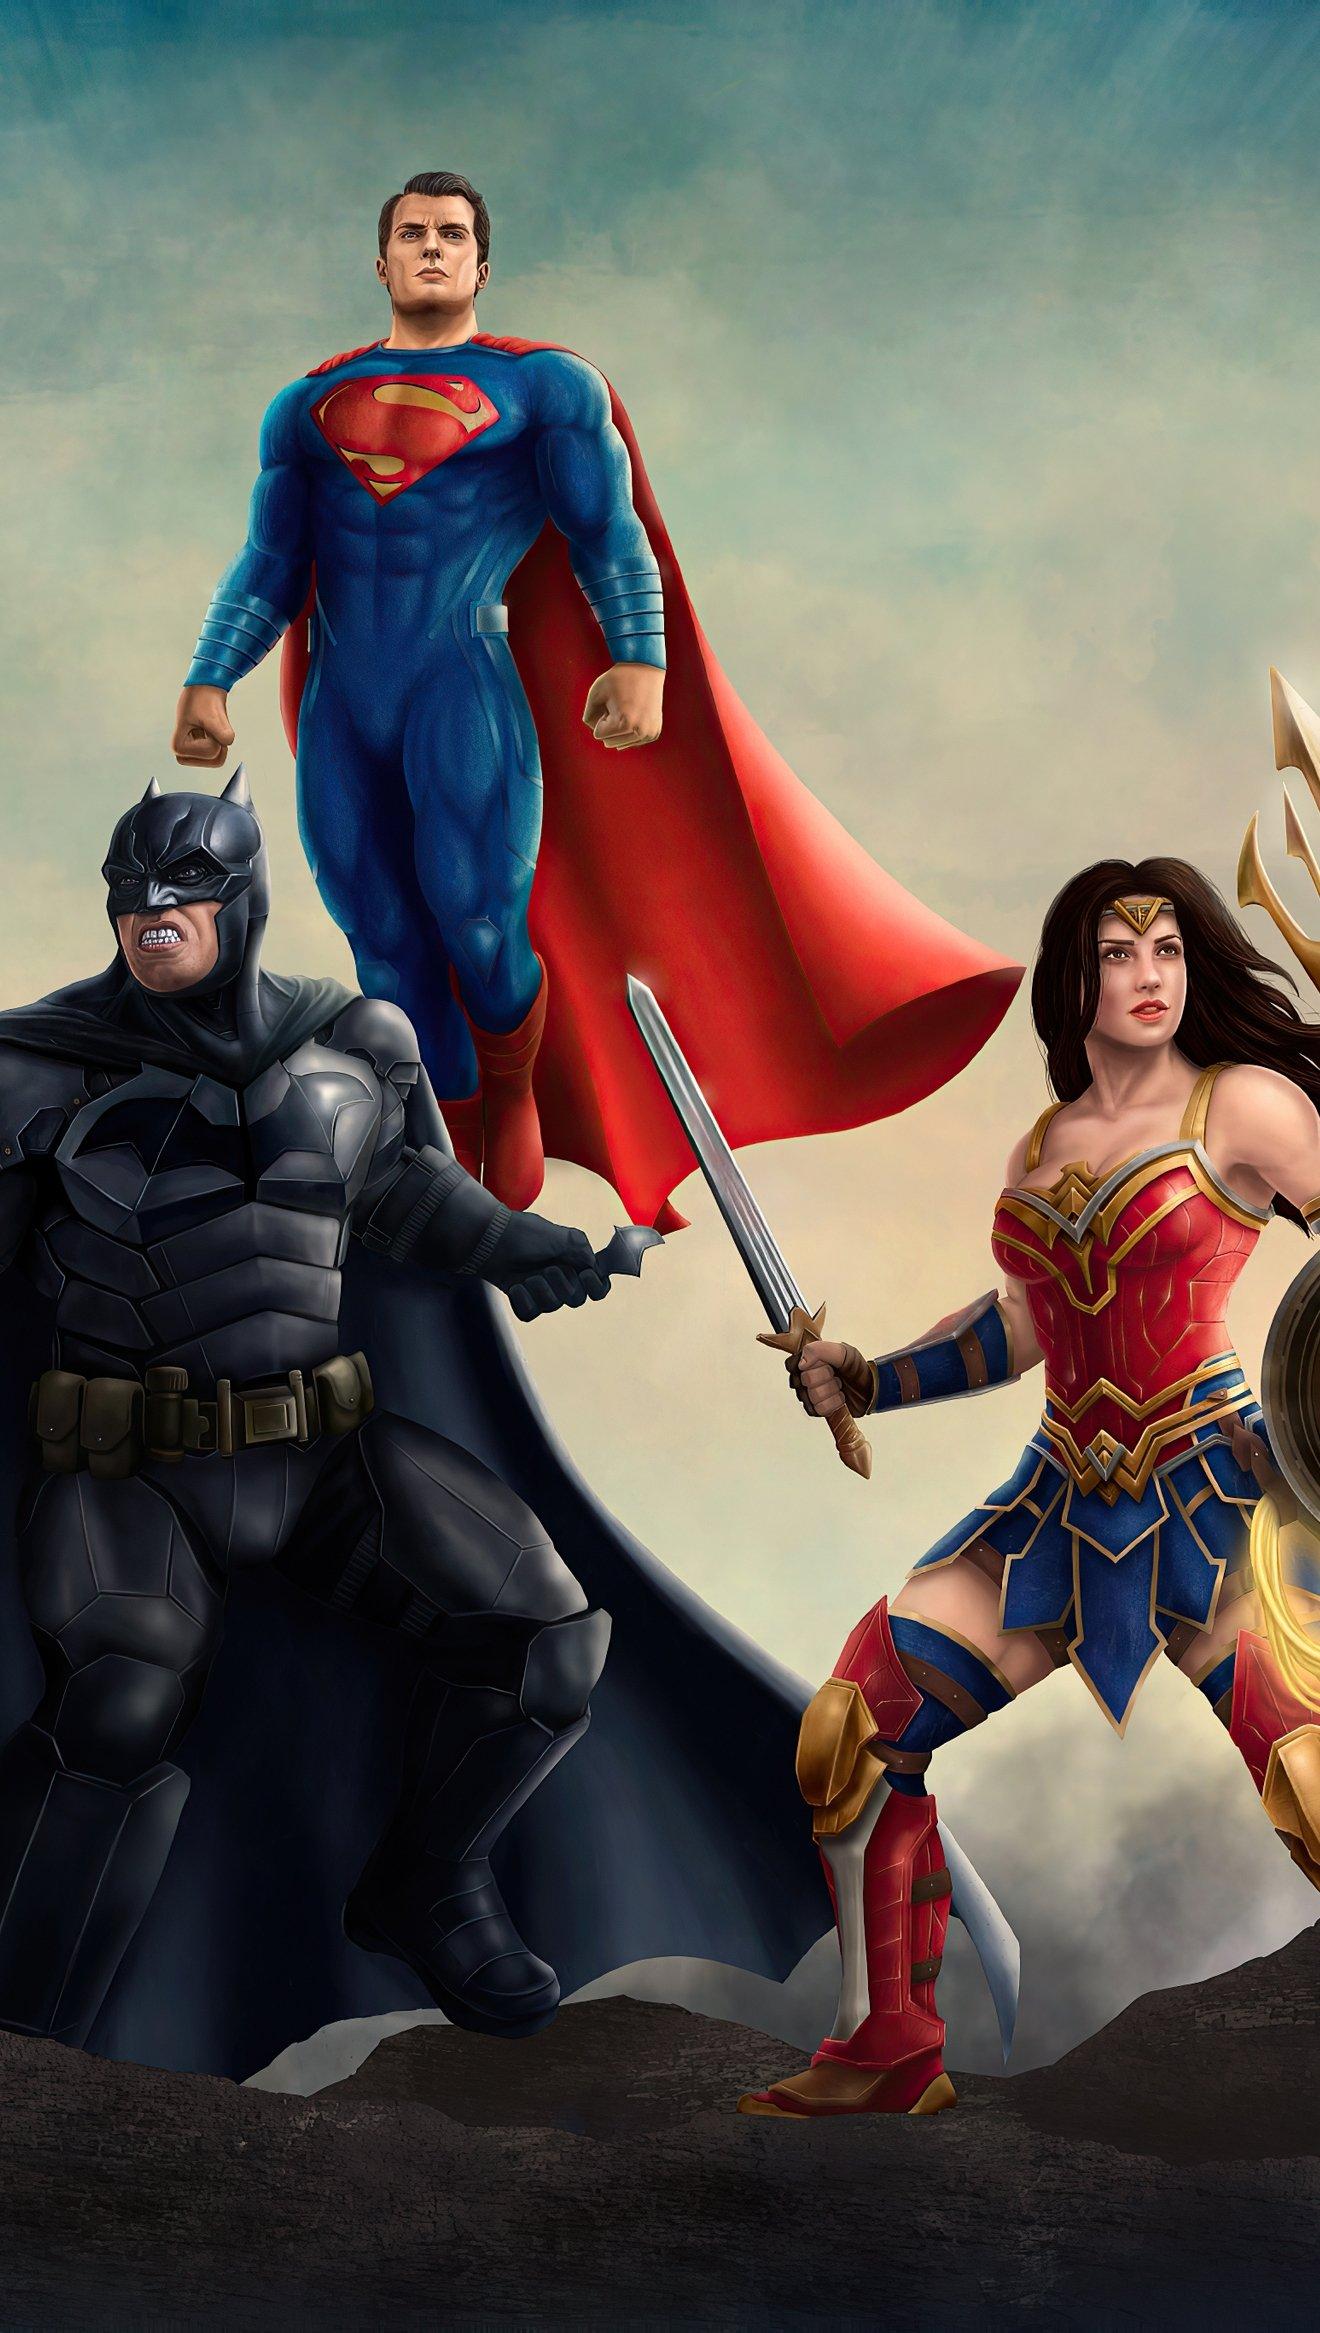 Fondos de pantalla Heroes de la Liga de la justicia 2020 Vertical